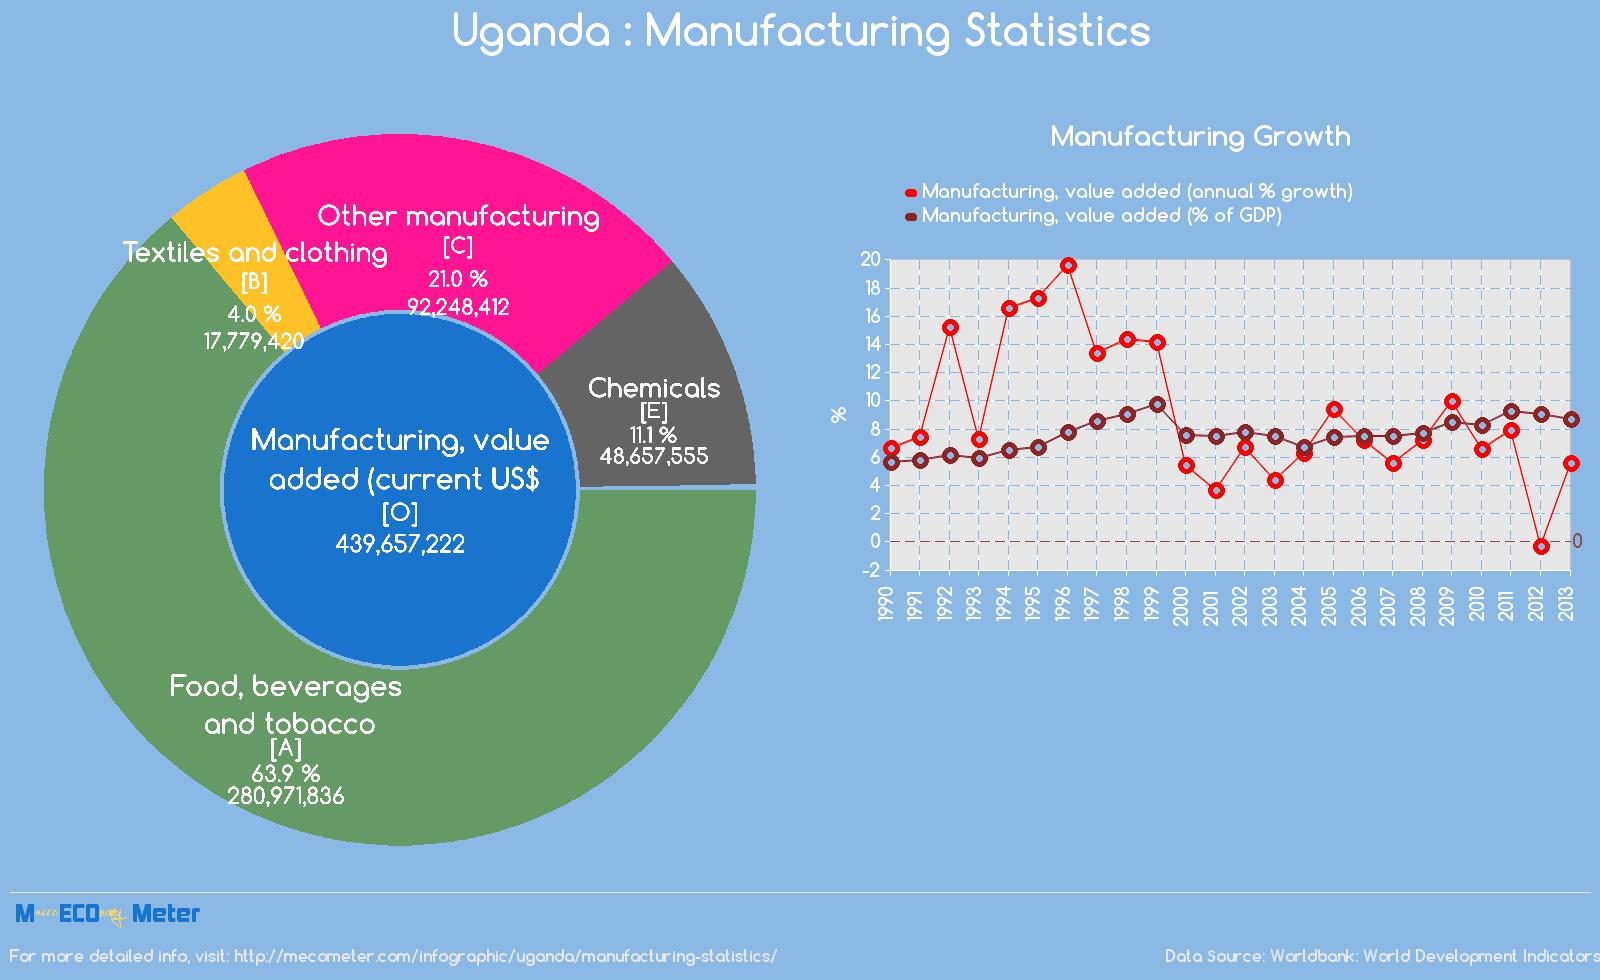 Uganda : Manufacturing Statistics